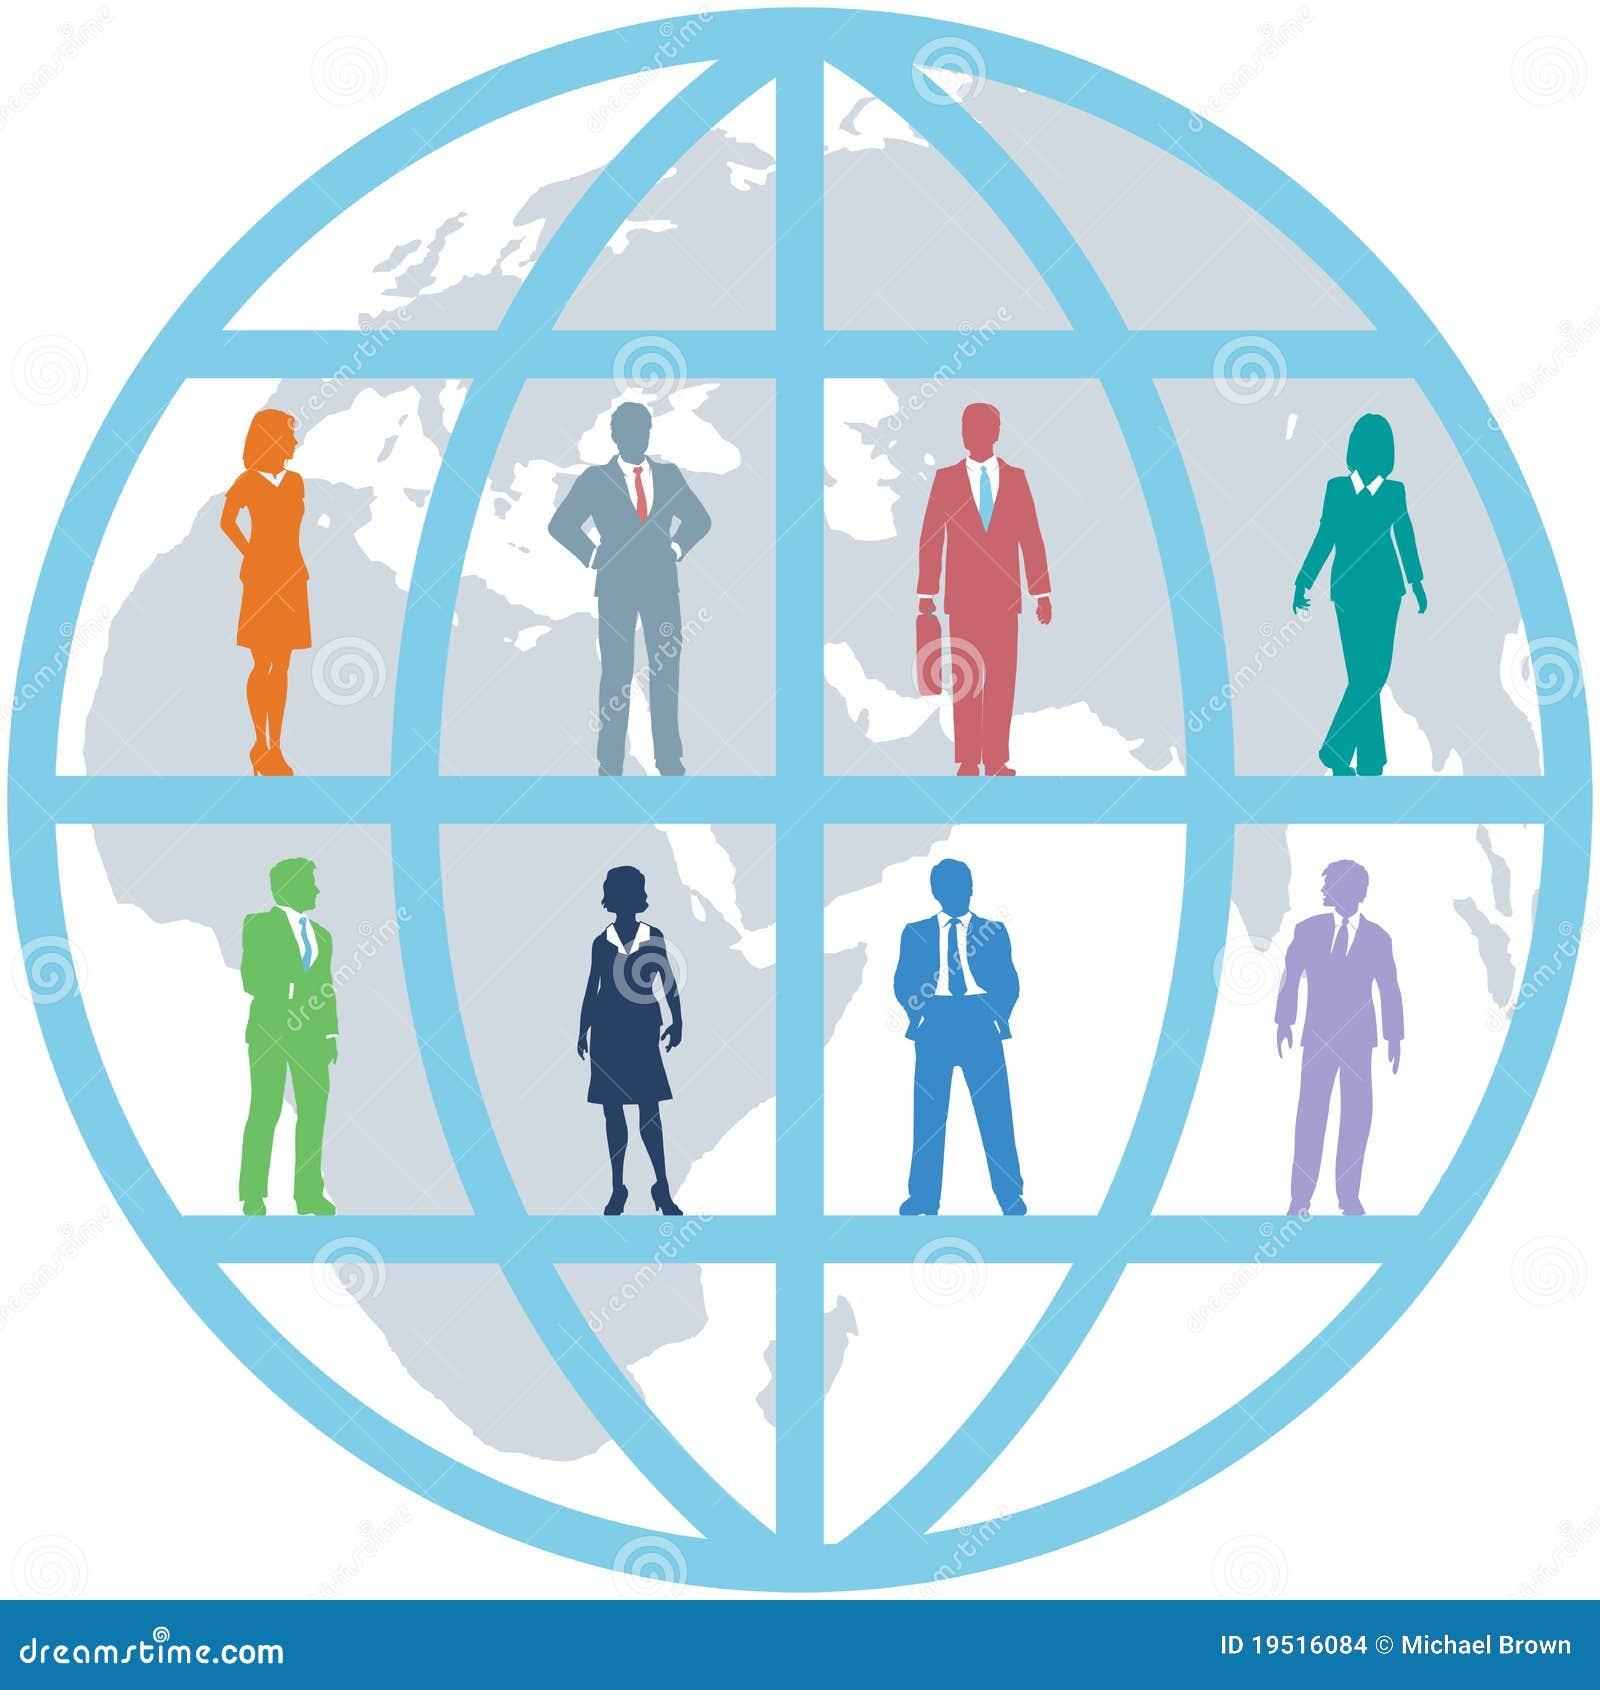 Human Resources world majors